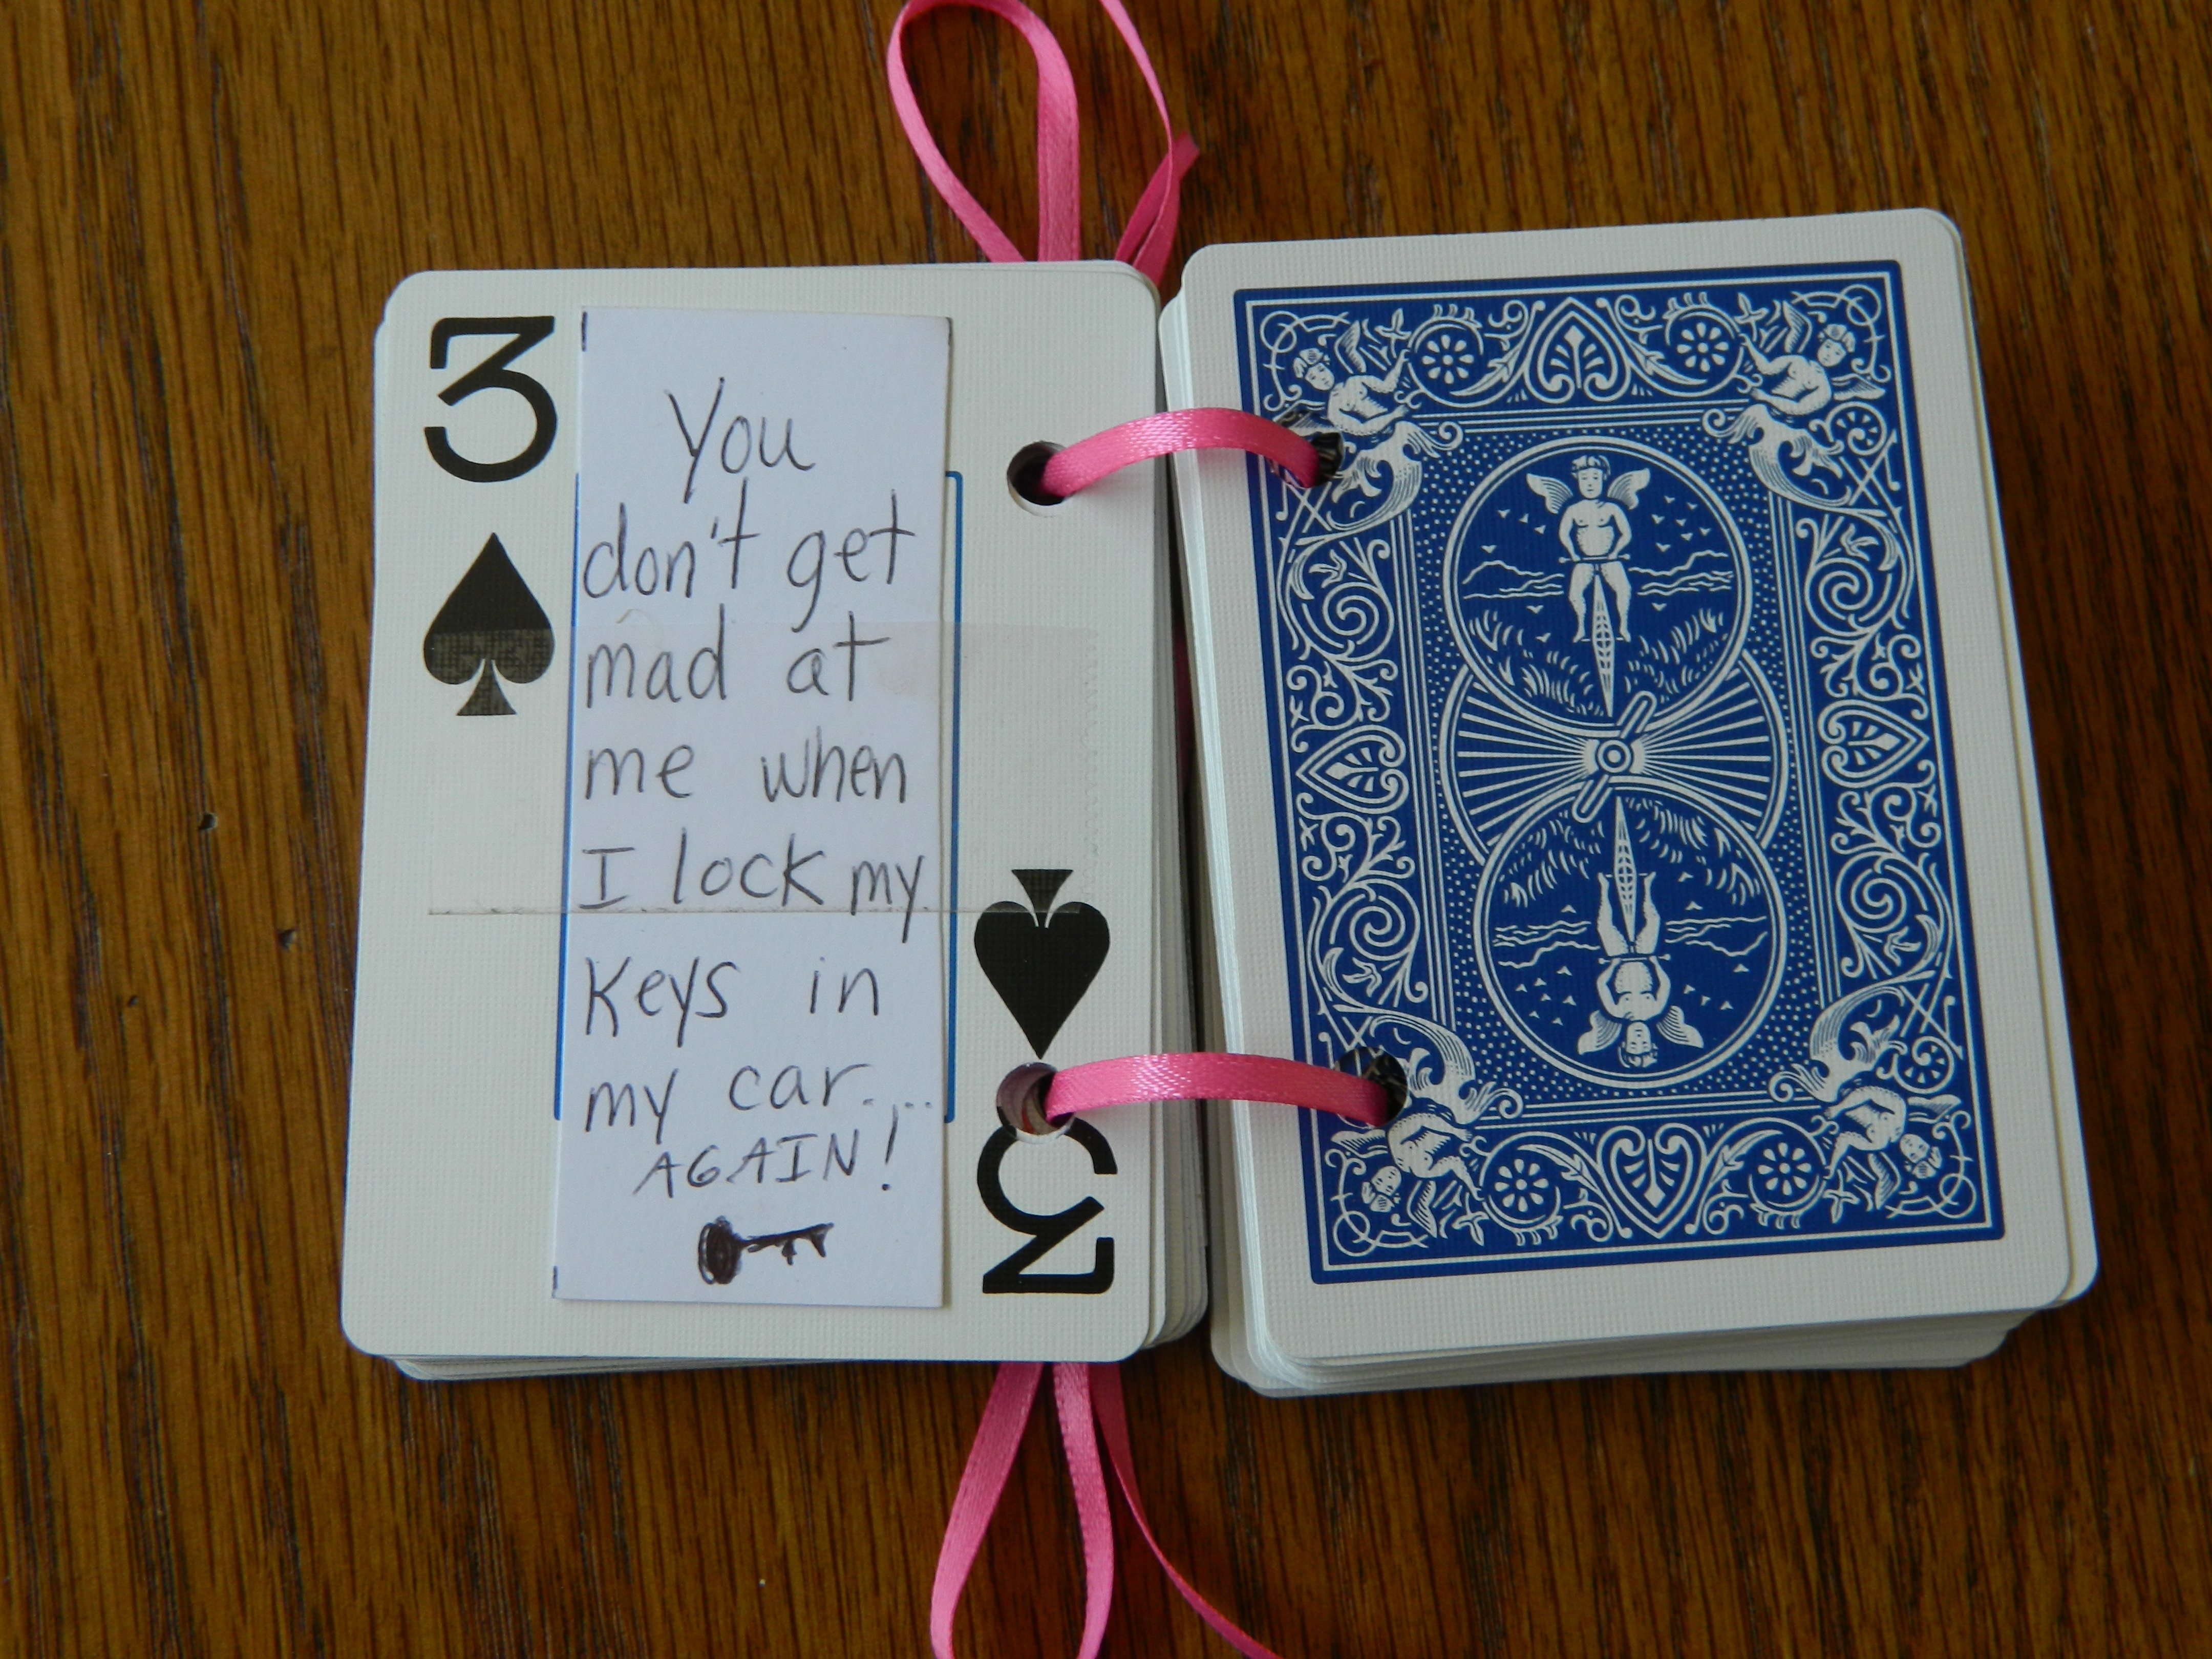 10 Cute Christmas Present Ideas For Best Friends sentimental graduation gifts friend gift ideas where it all began 3 2020